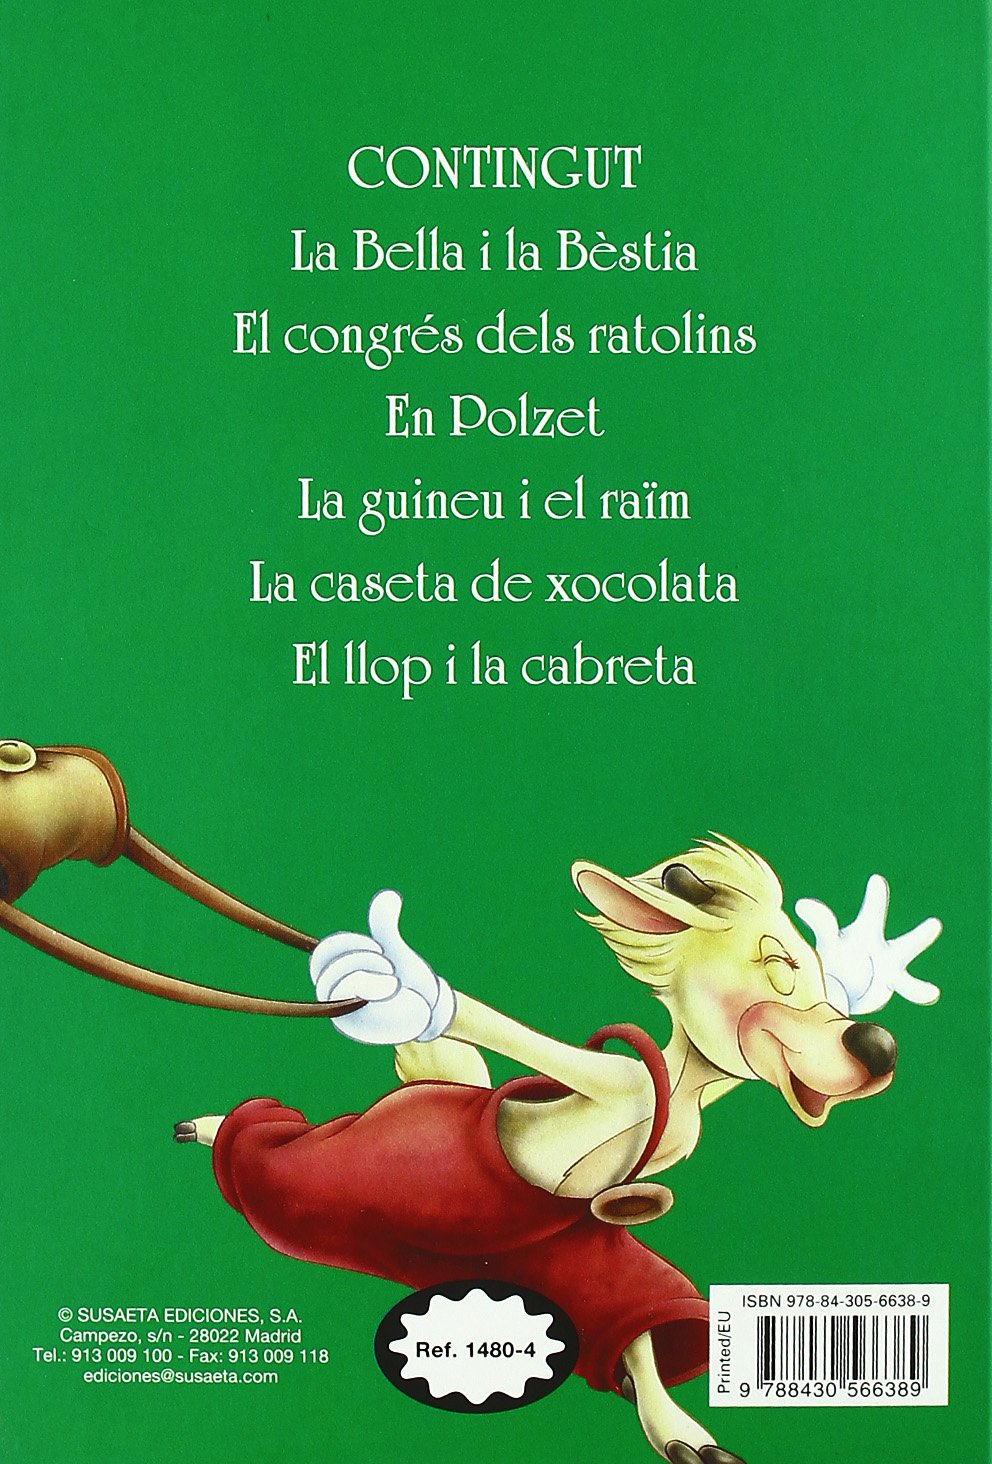 MES CONTES I FAULES - 4: Susaeta Ediciones: 9788430566389: Amazon.com: Books